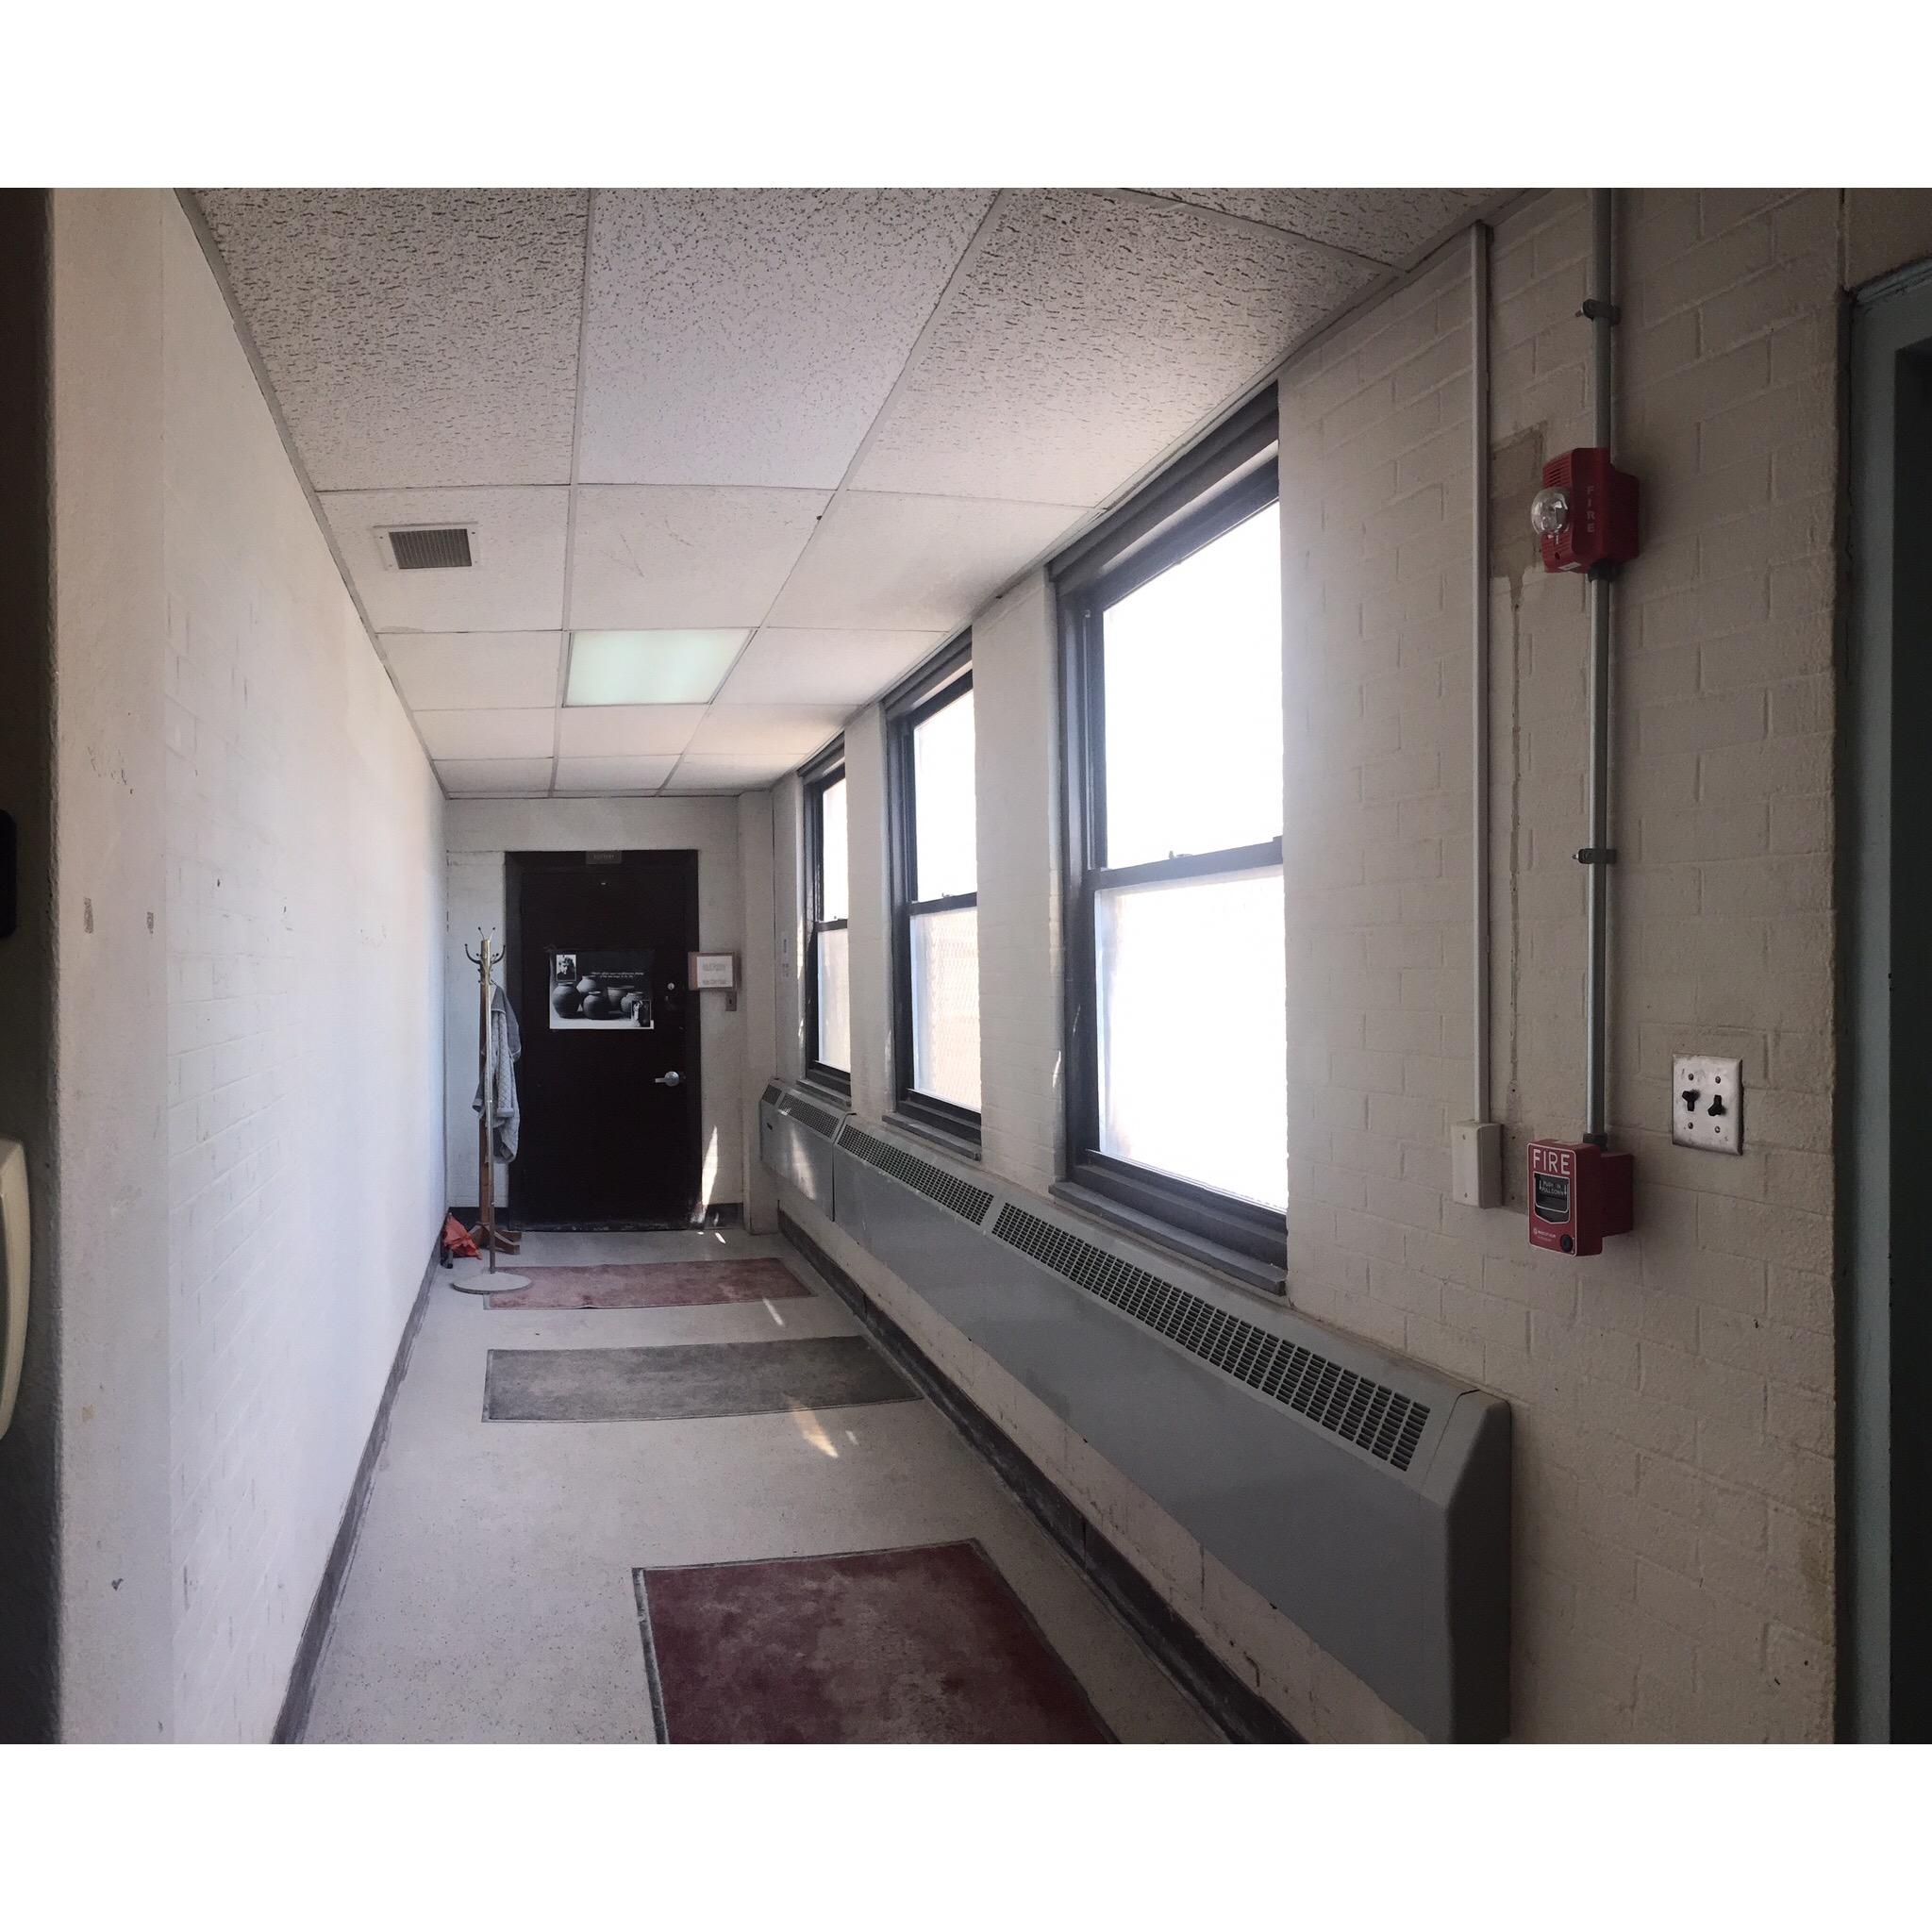 Before shot of hallway